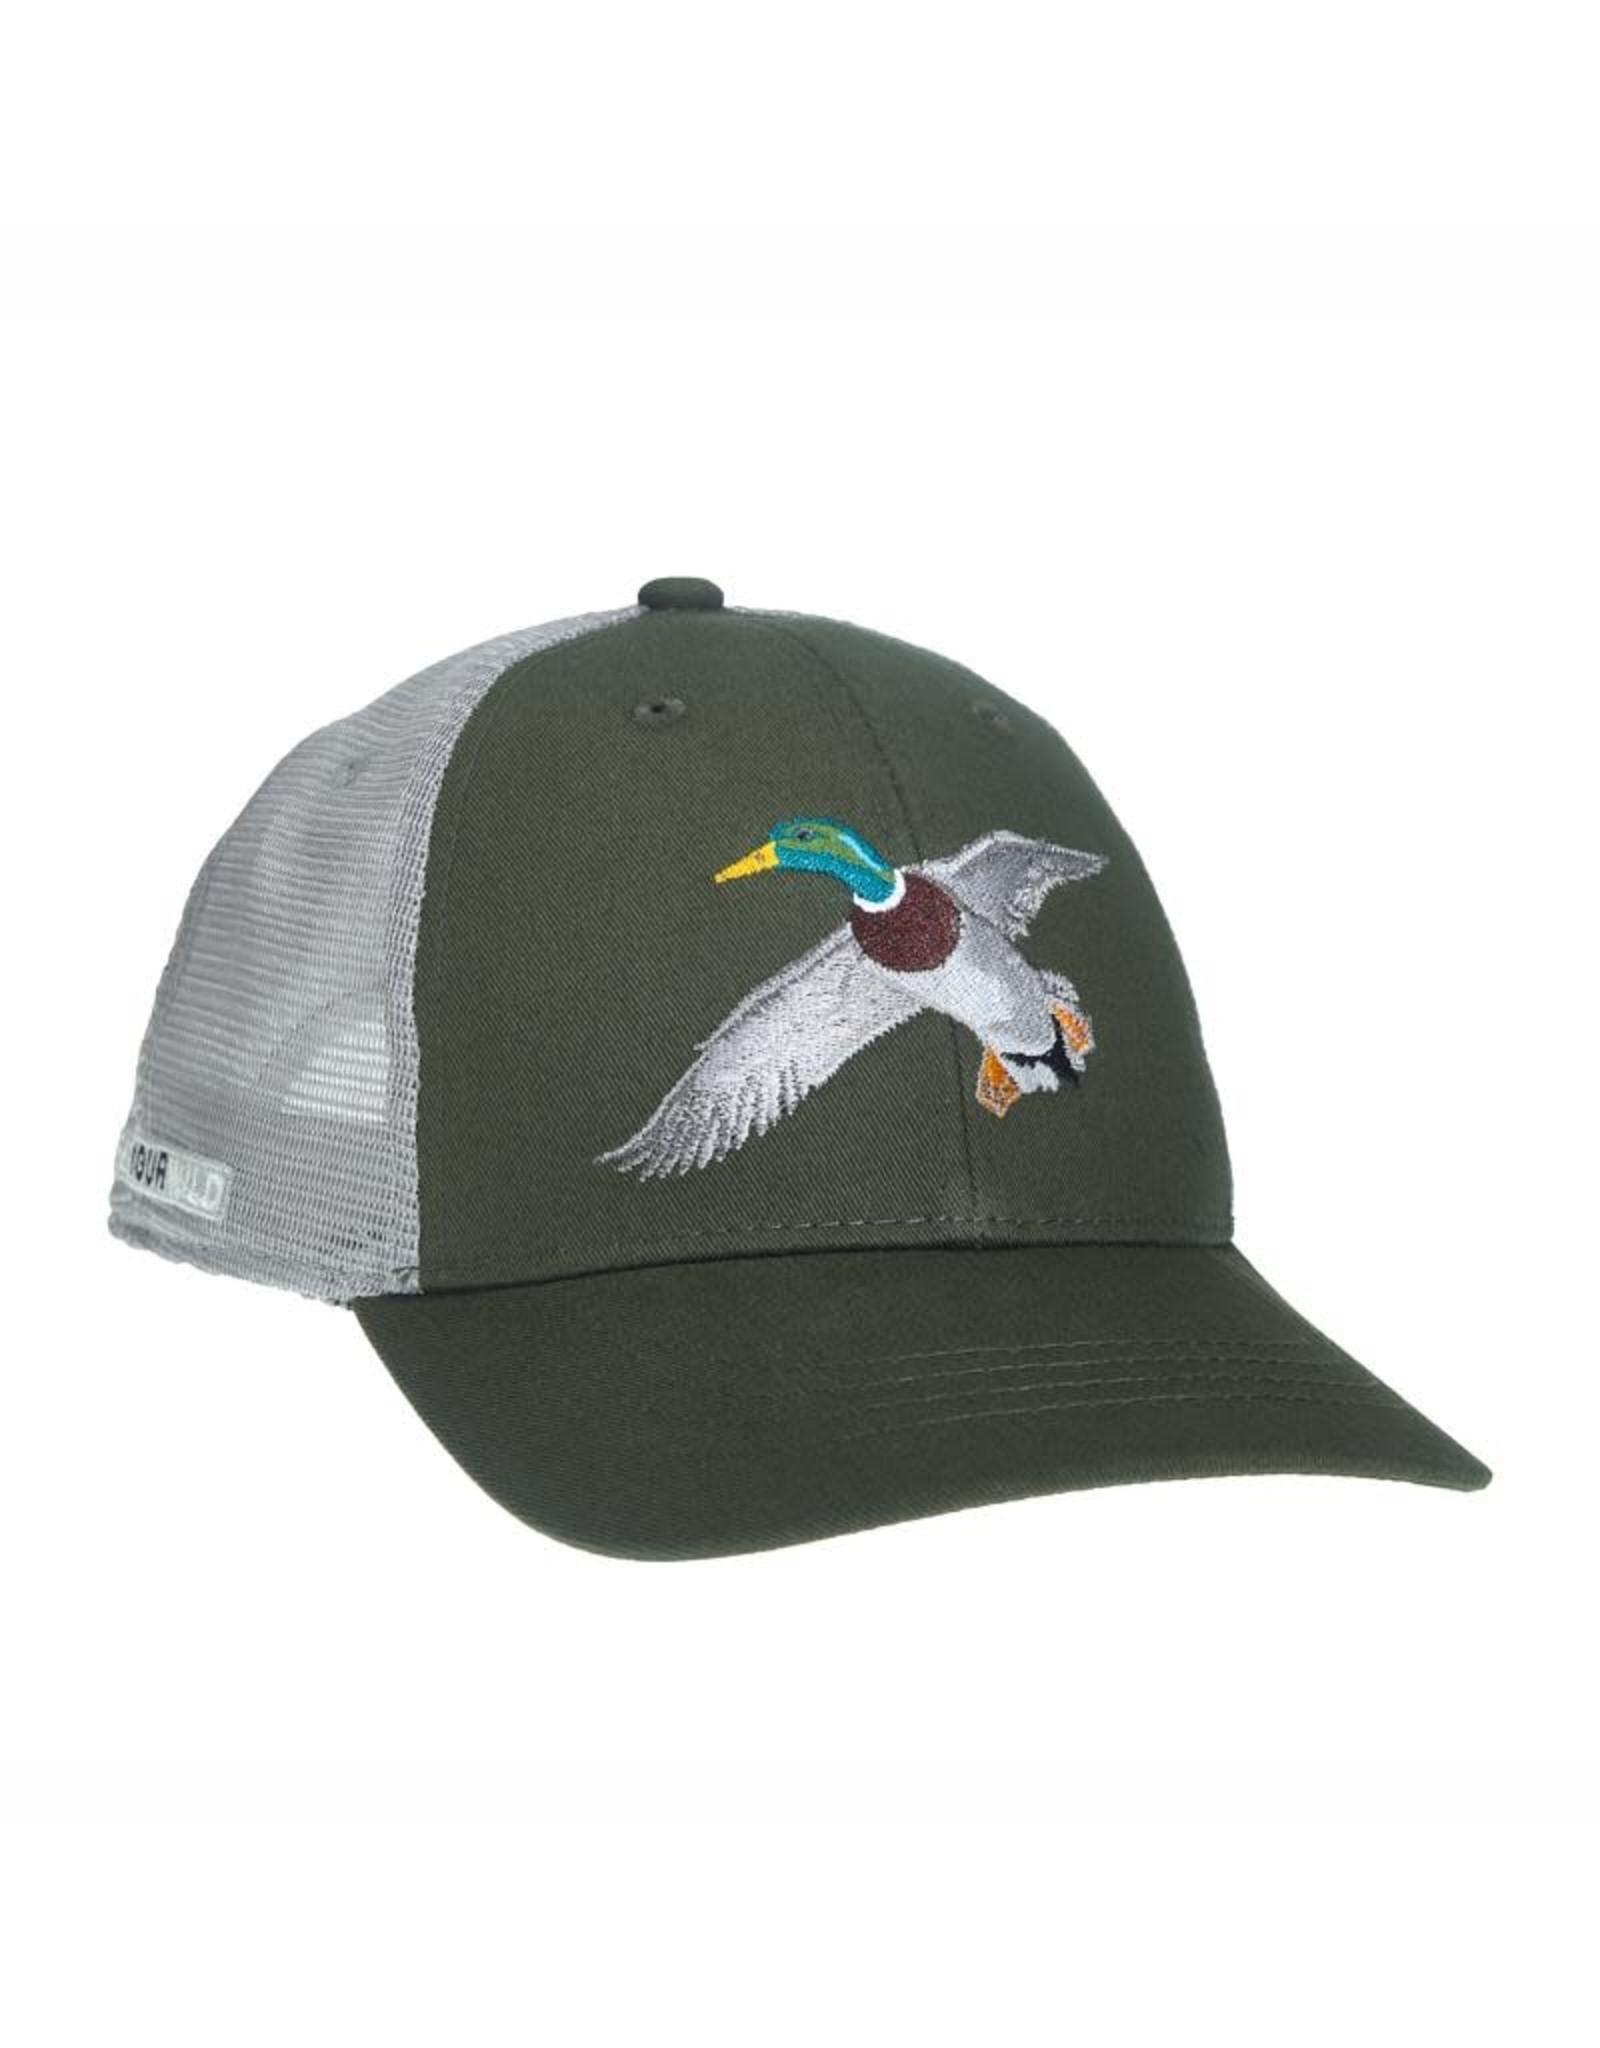 Rep Your Water RepYourWild Artist Edition Greenhead Hat